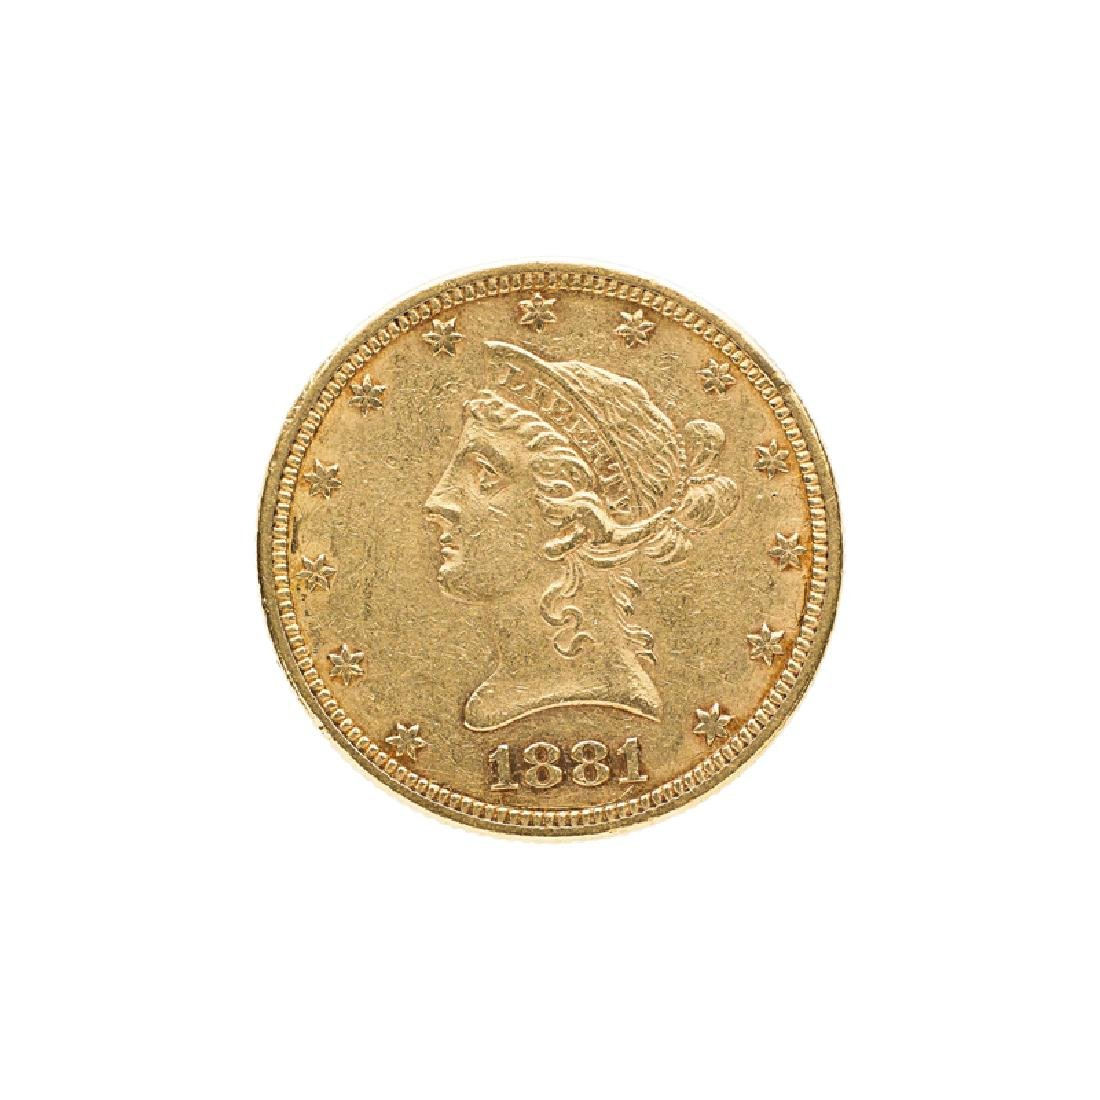 1881 $10.00 LIBERTY HEAD GOLD COIN